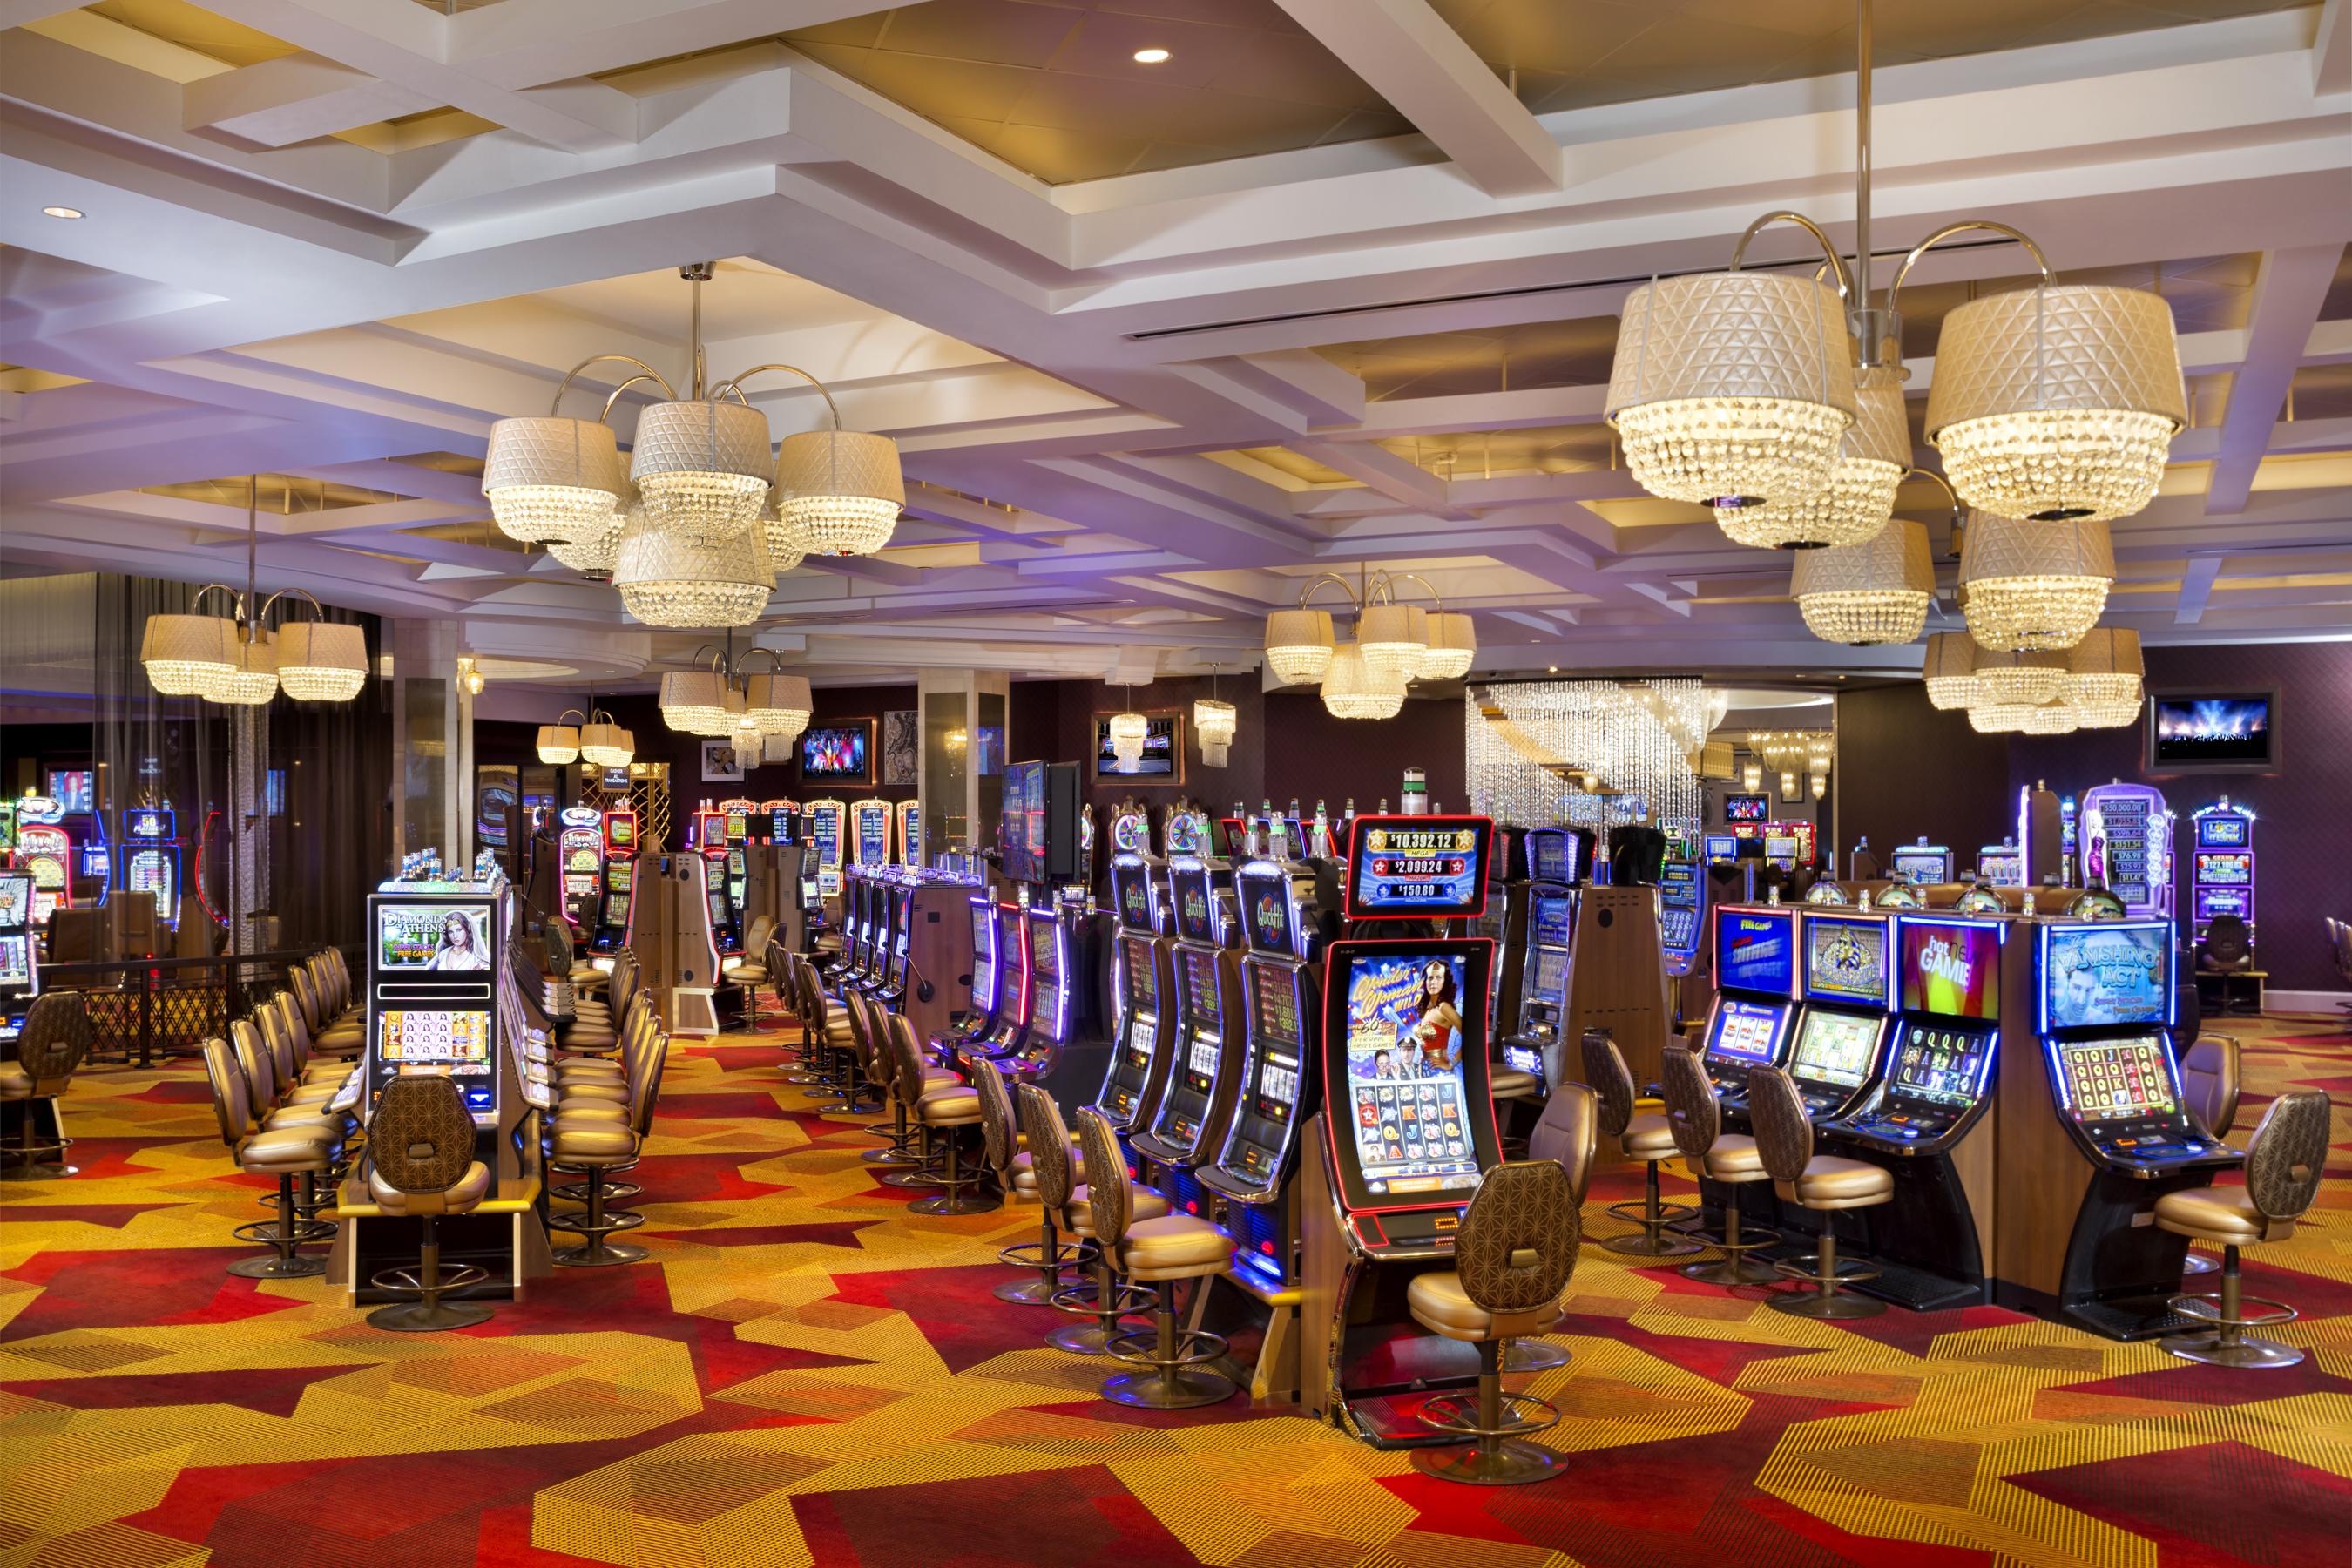 Hard rock casino tampa history free fun slot machine games online